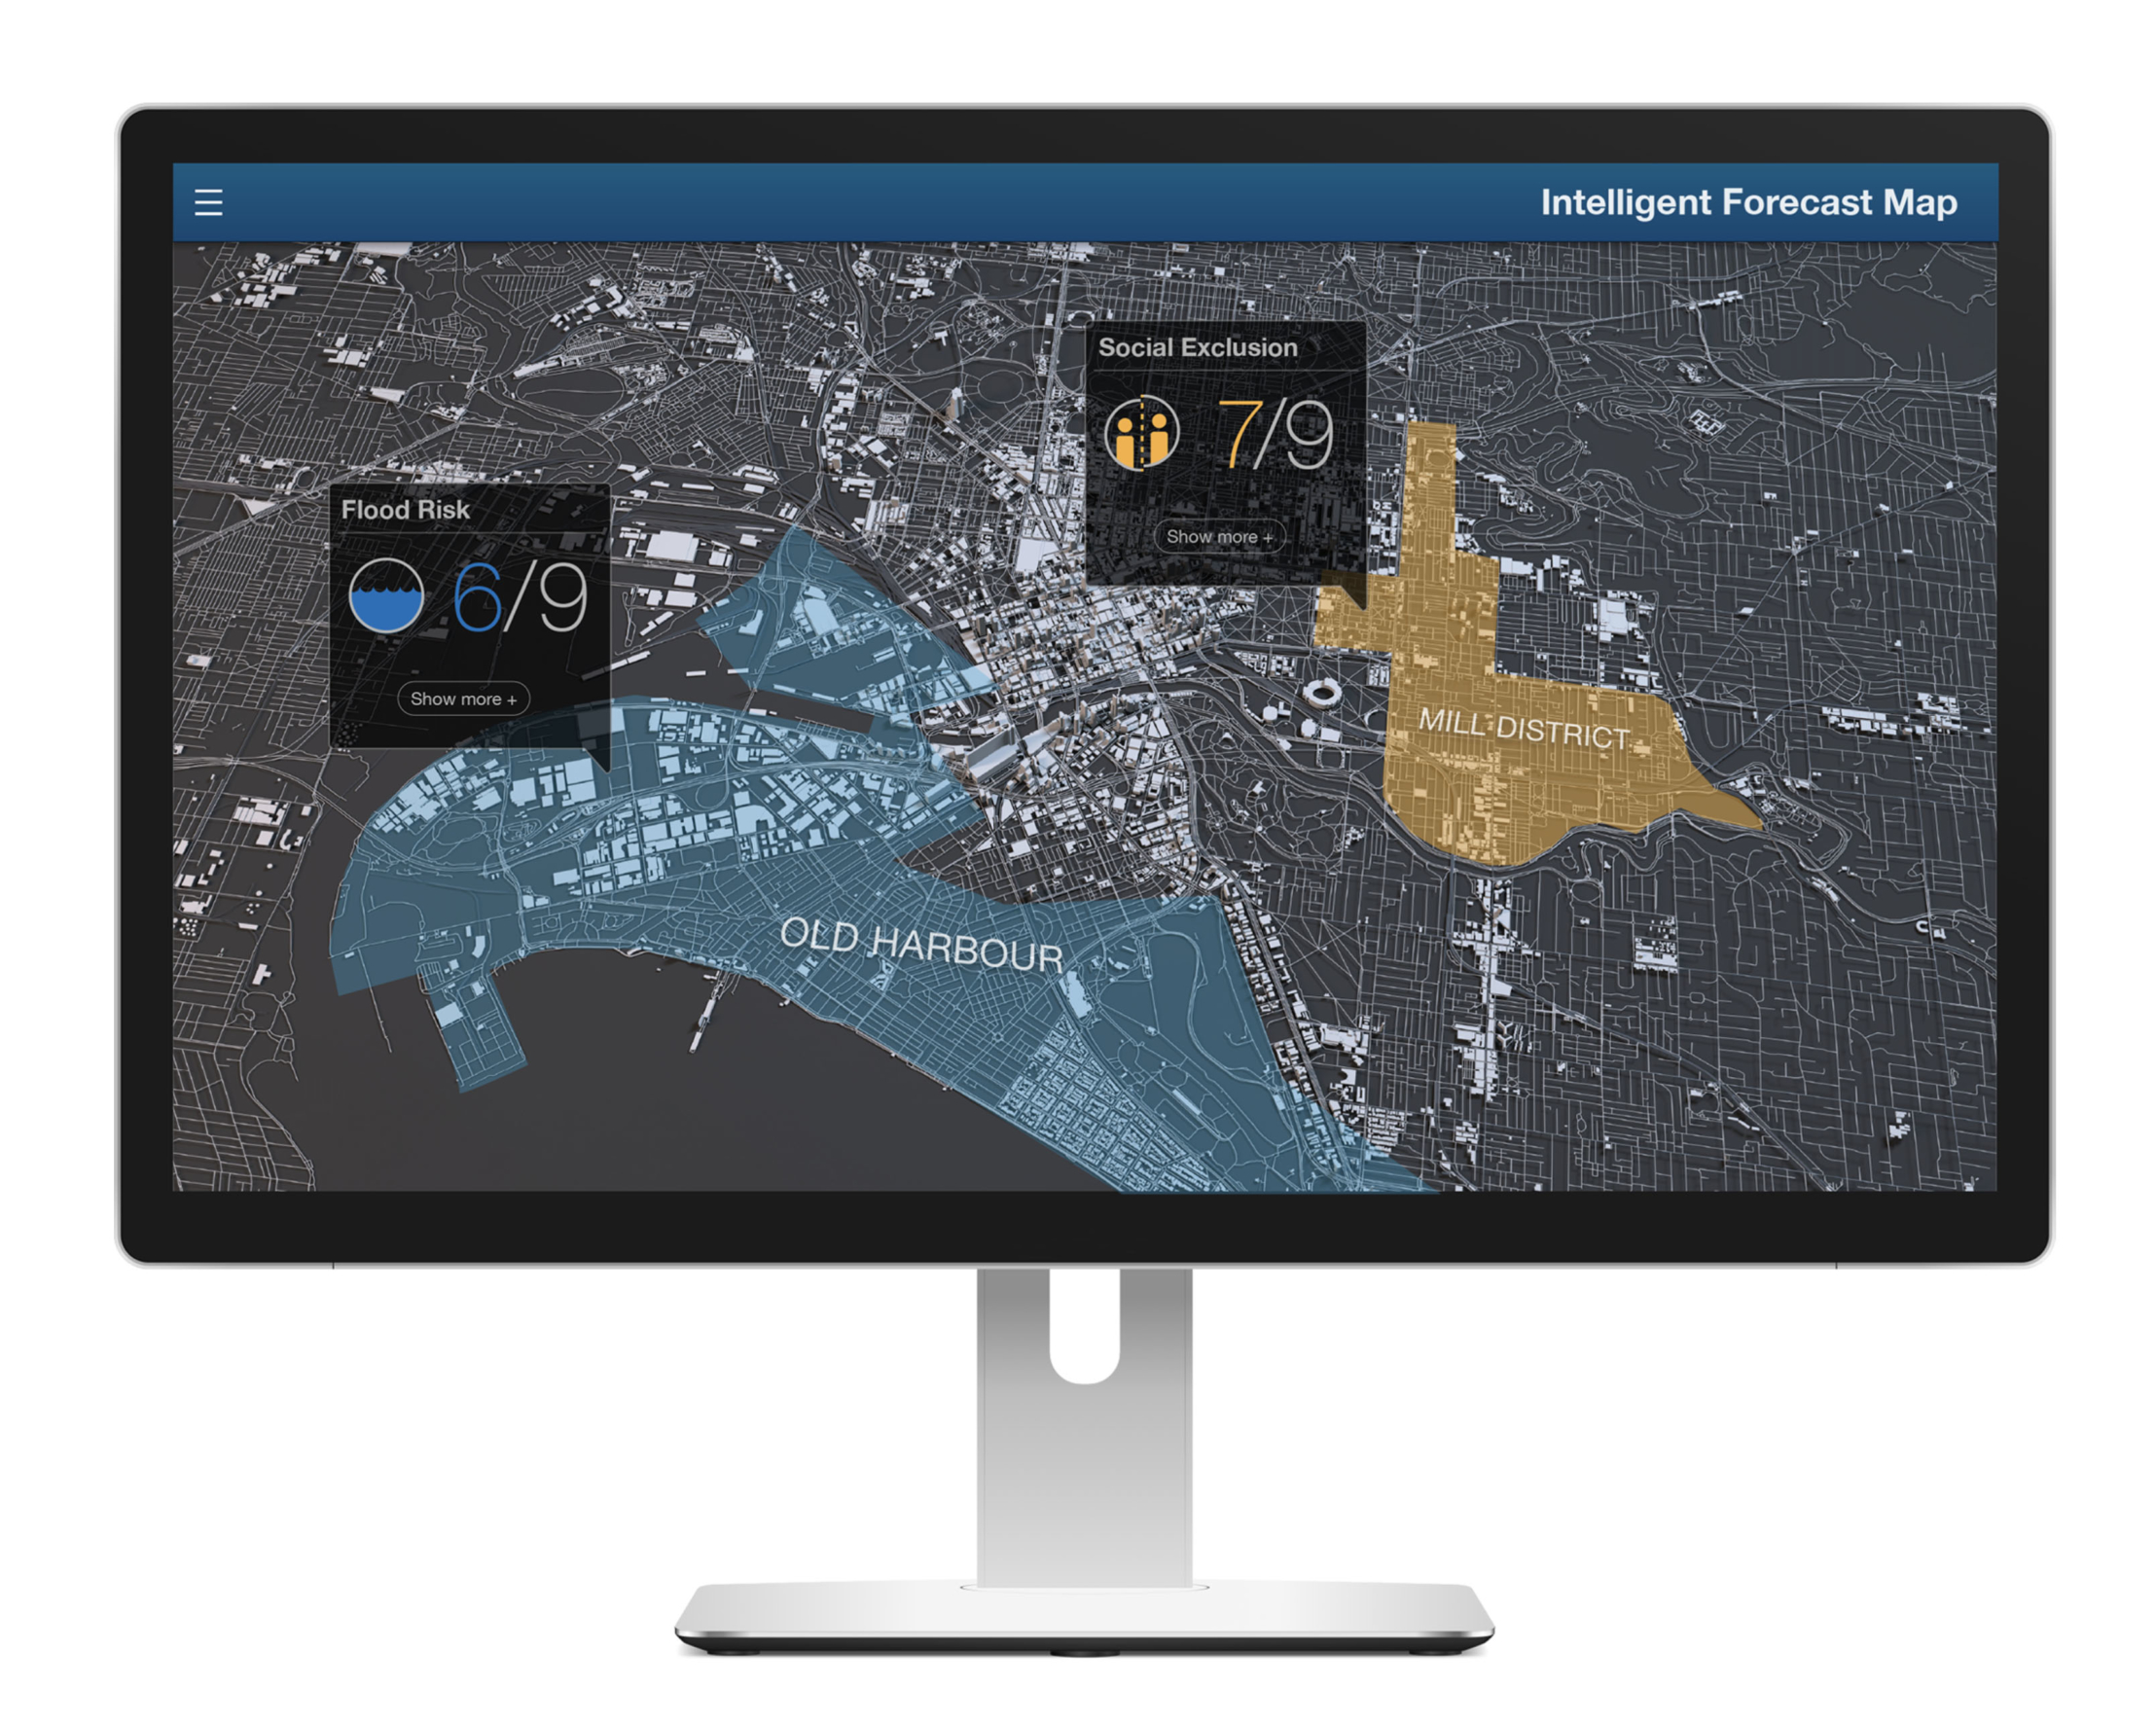 Intelligent Forecast Map